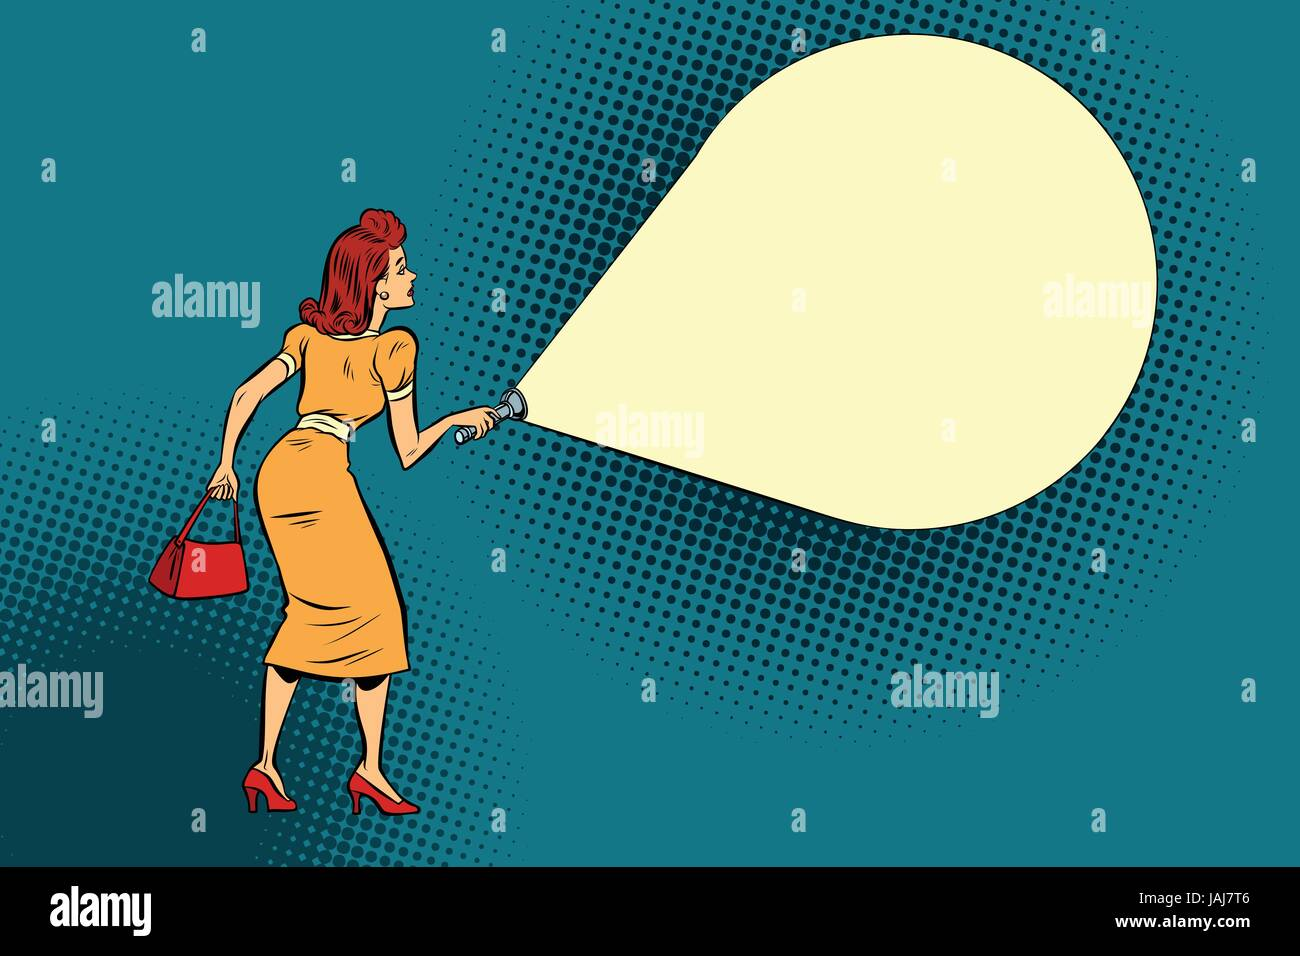 woman light flashlight - Stock Image